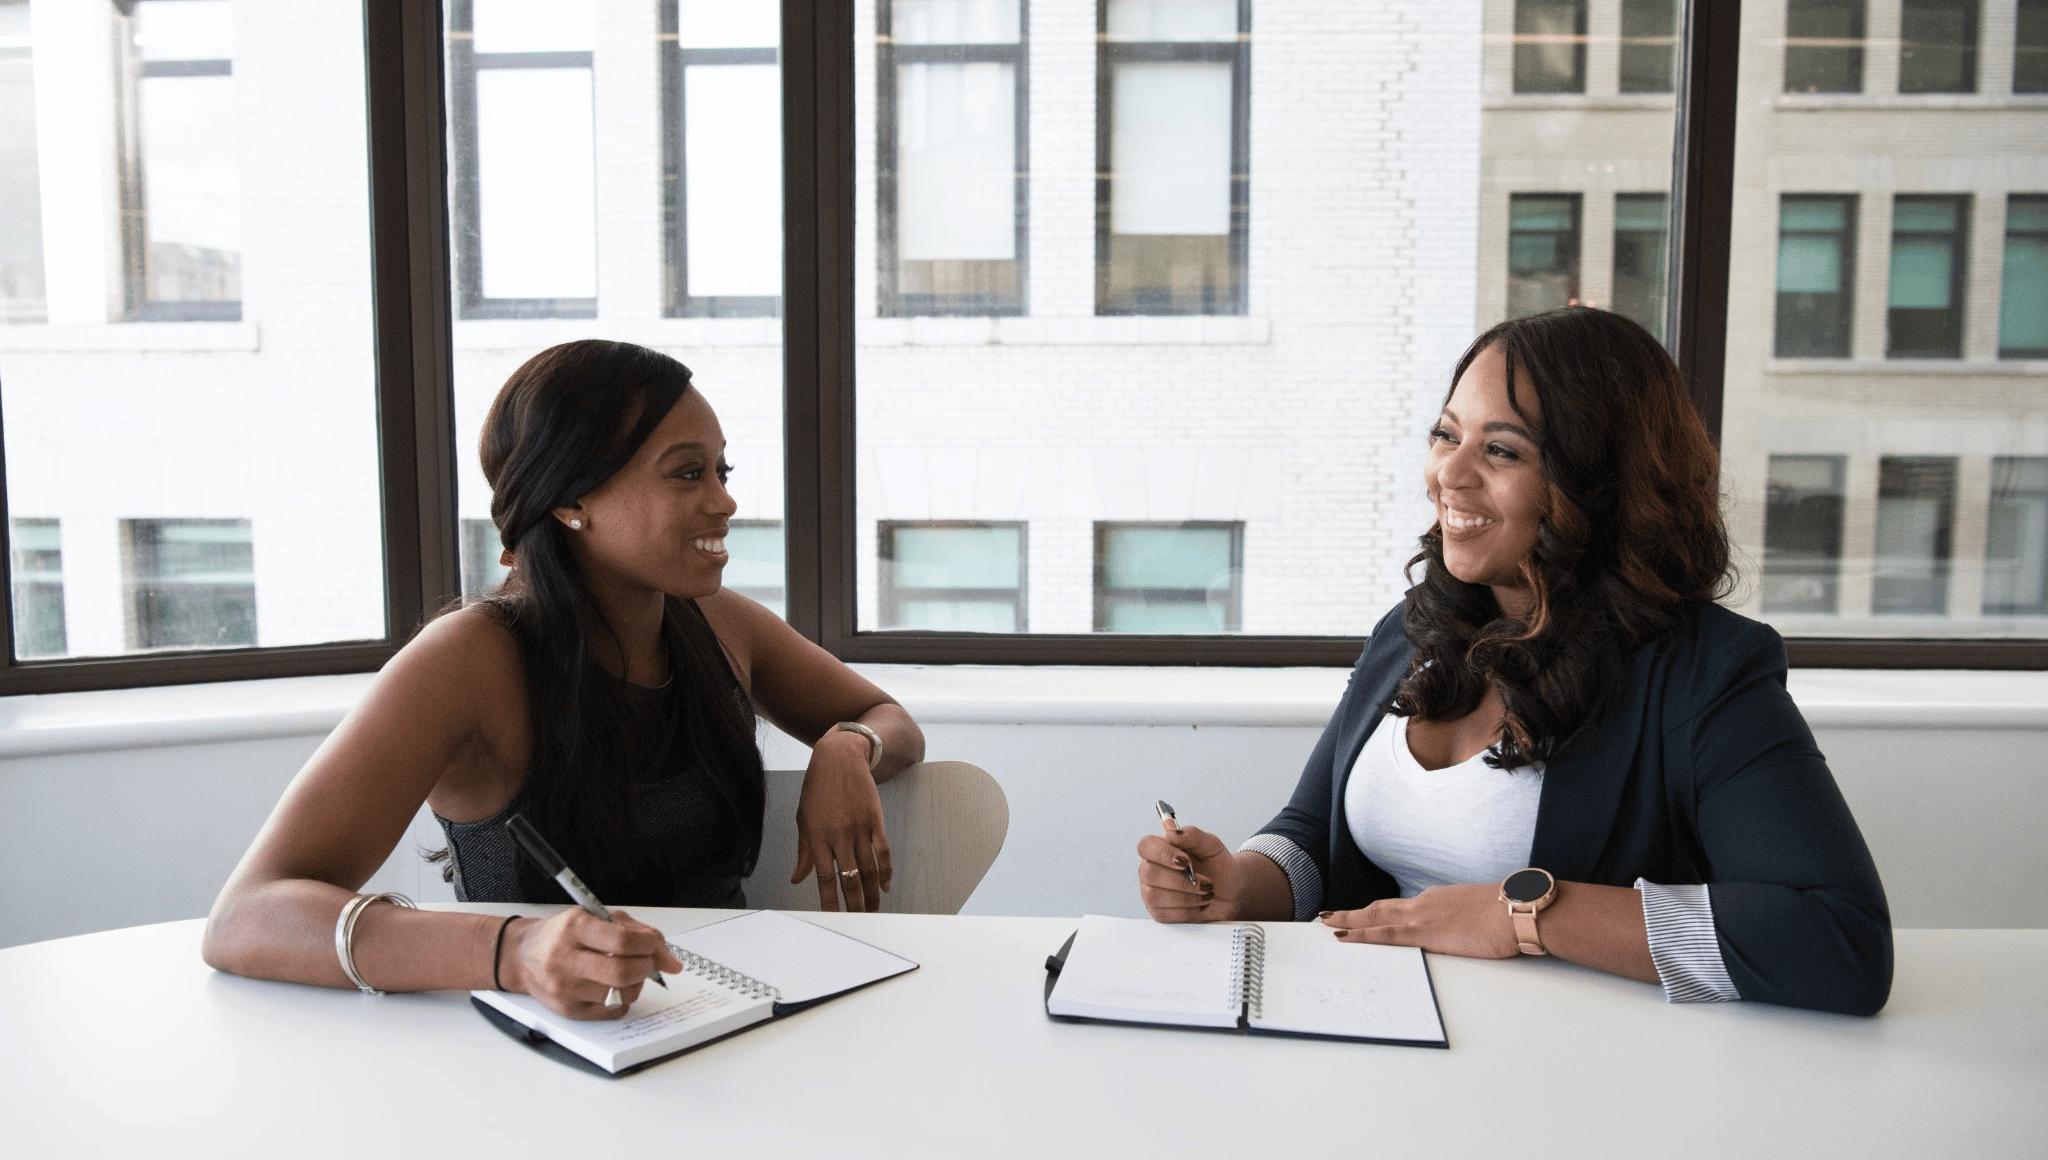 two women having fun discussion